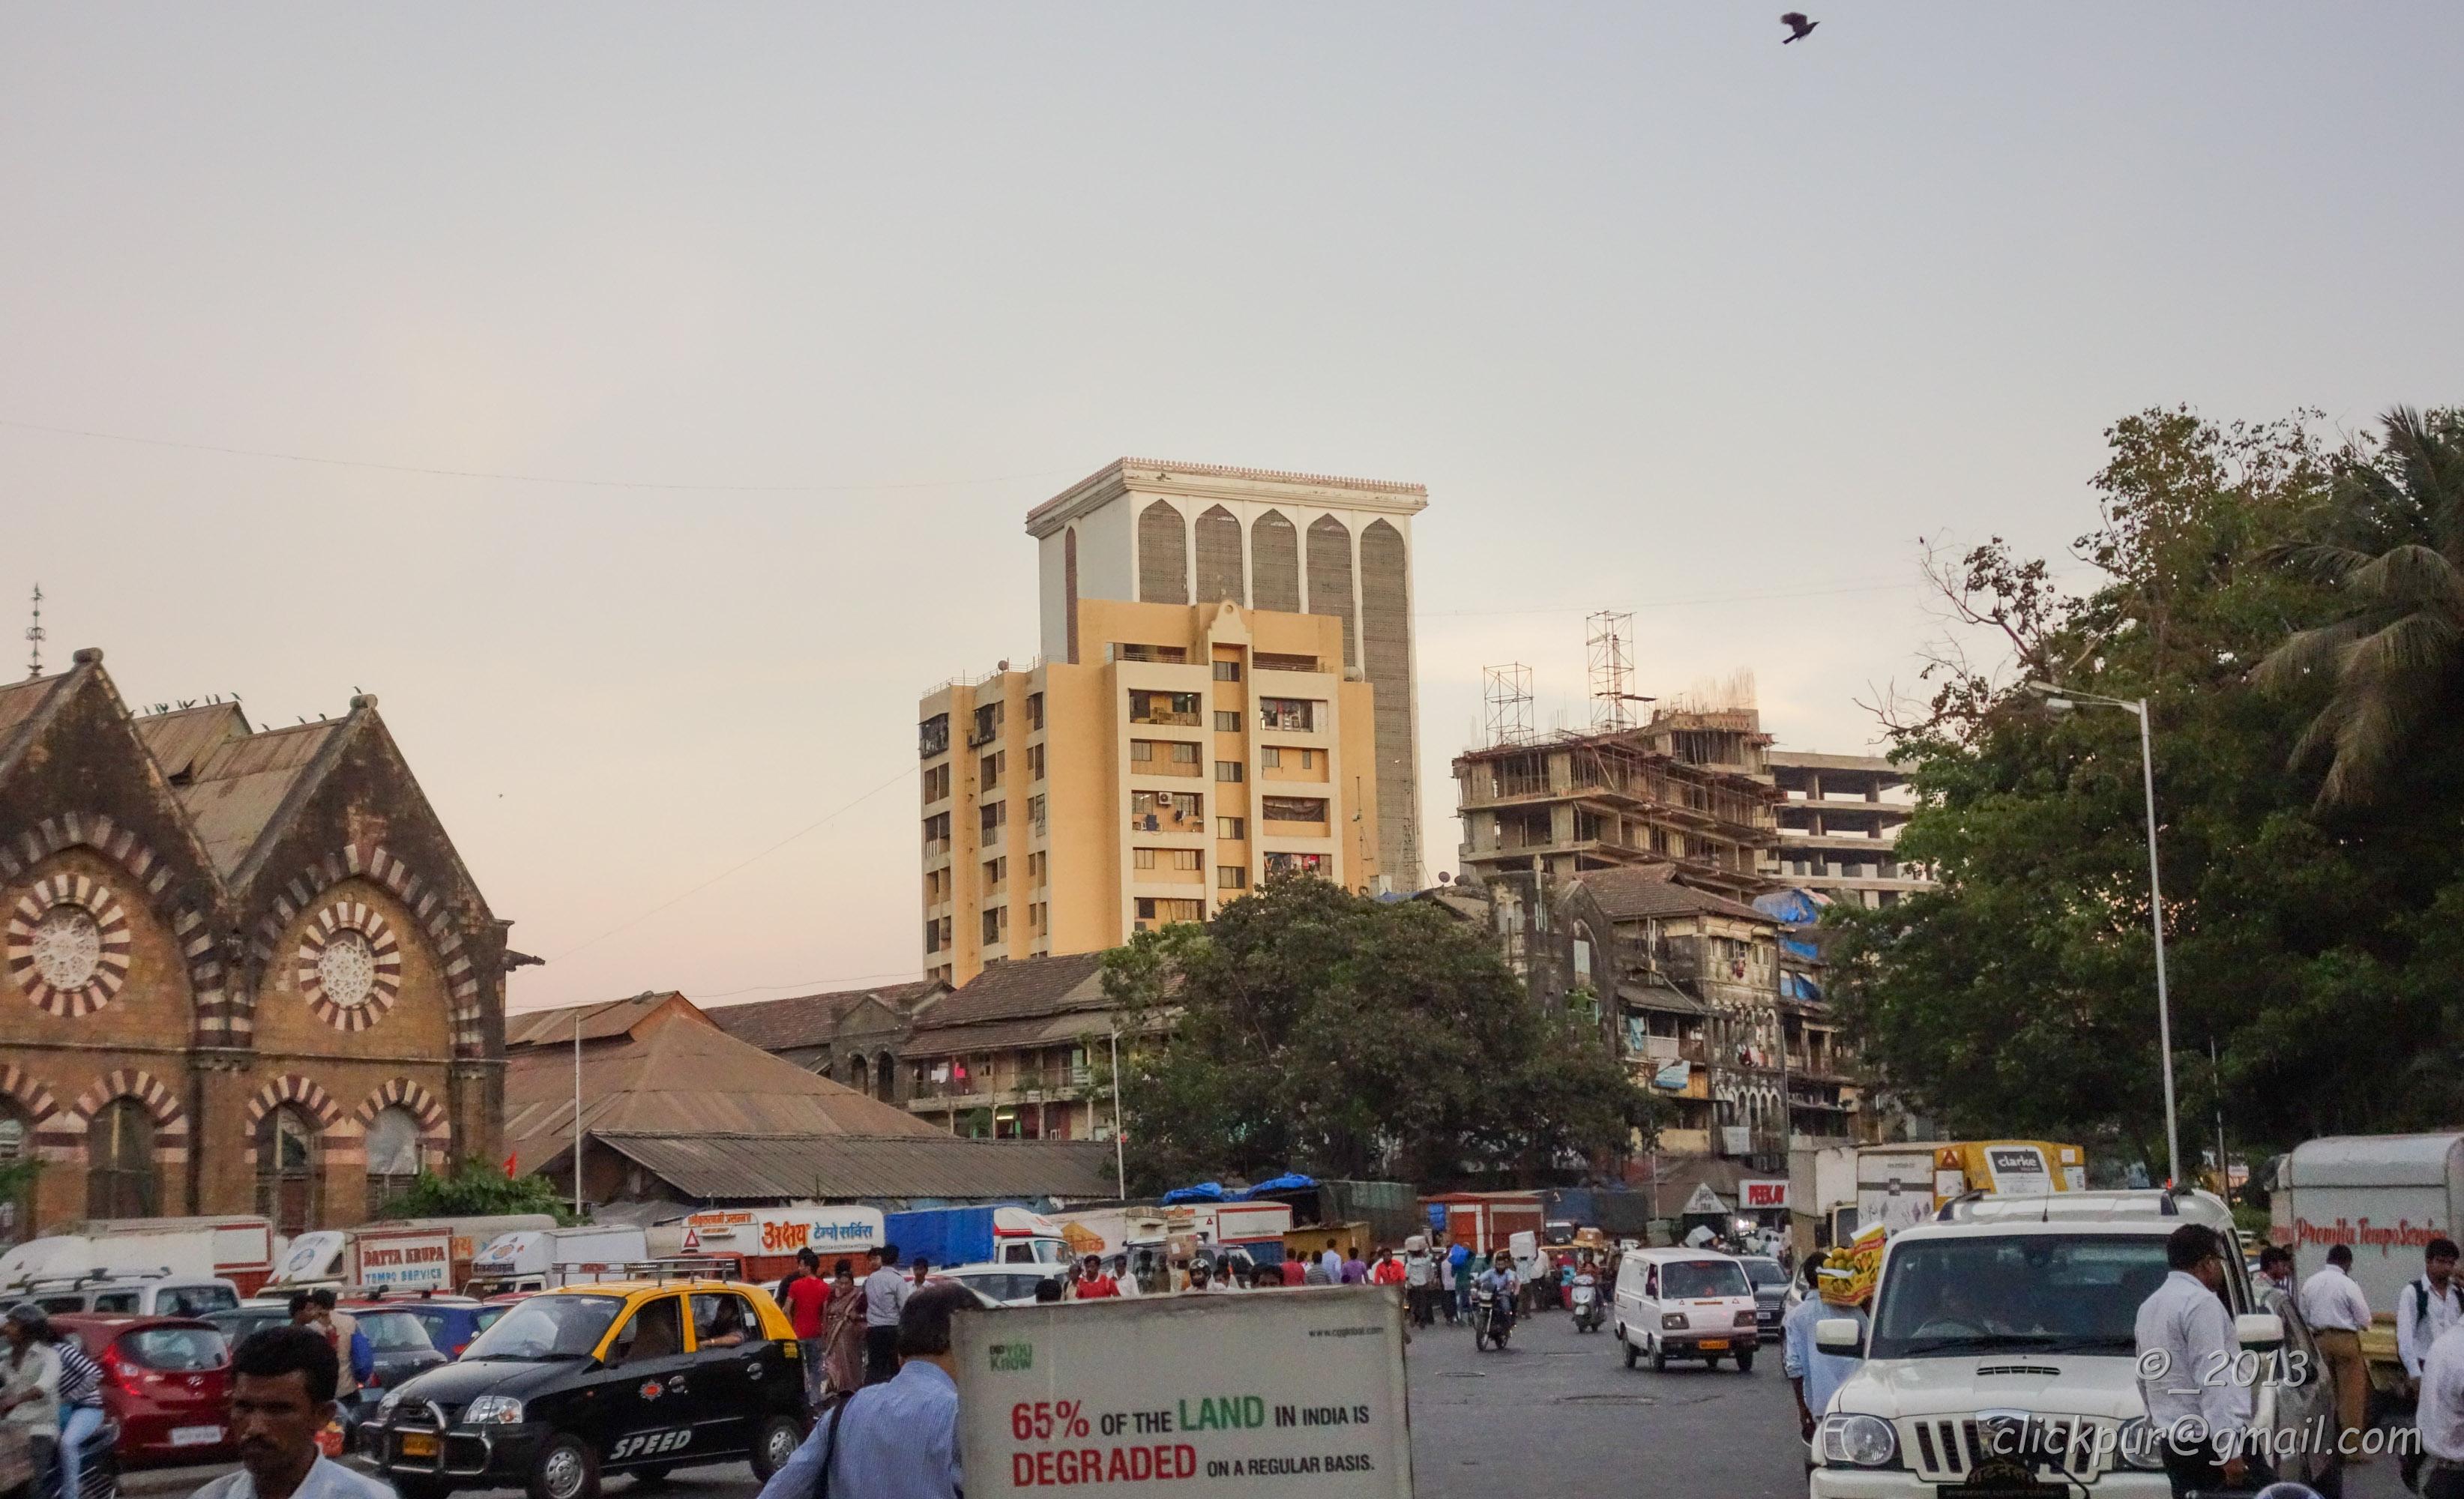 File:Dhobi Talao, Chhatrapati Shivaji Terminus Area, Fort